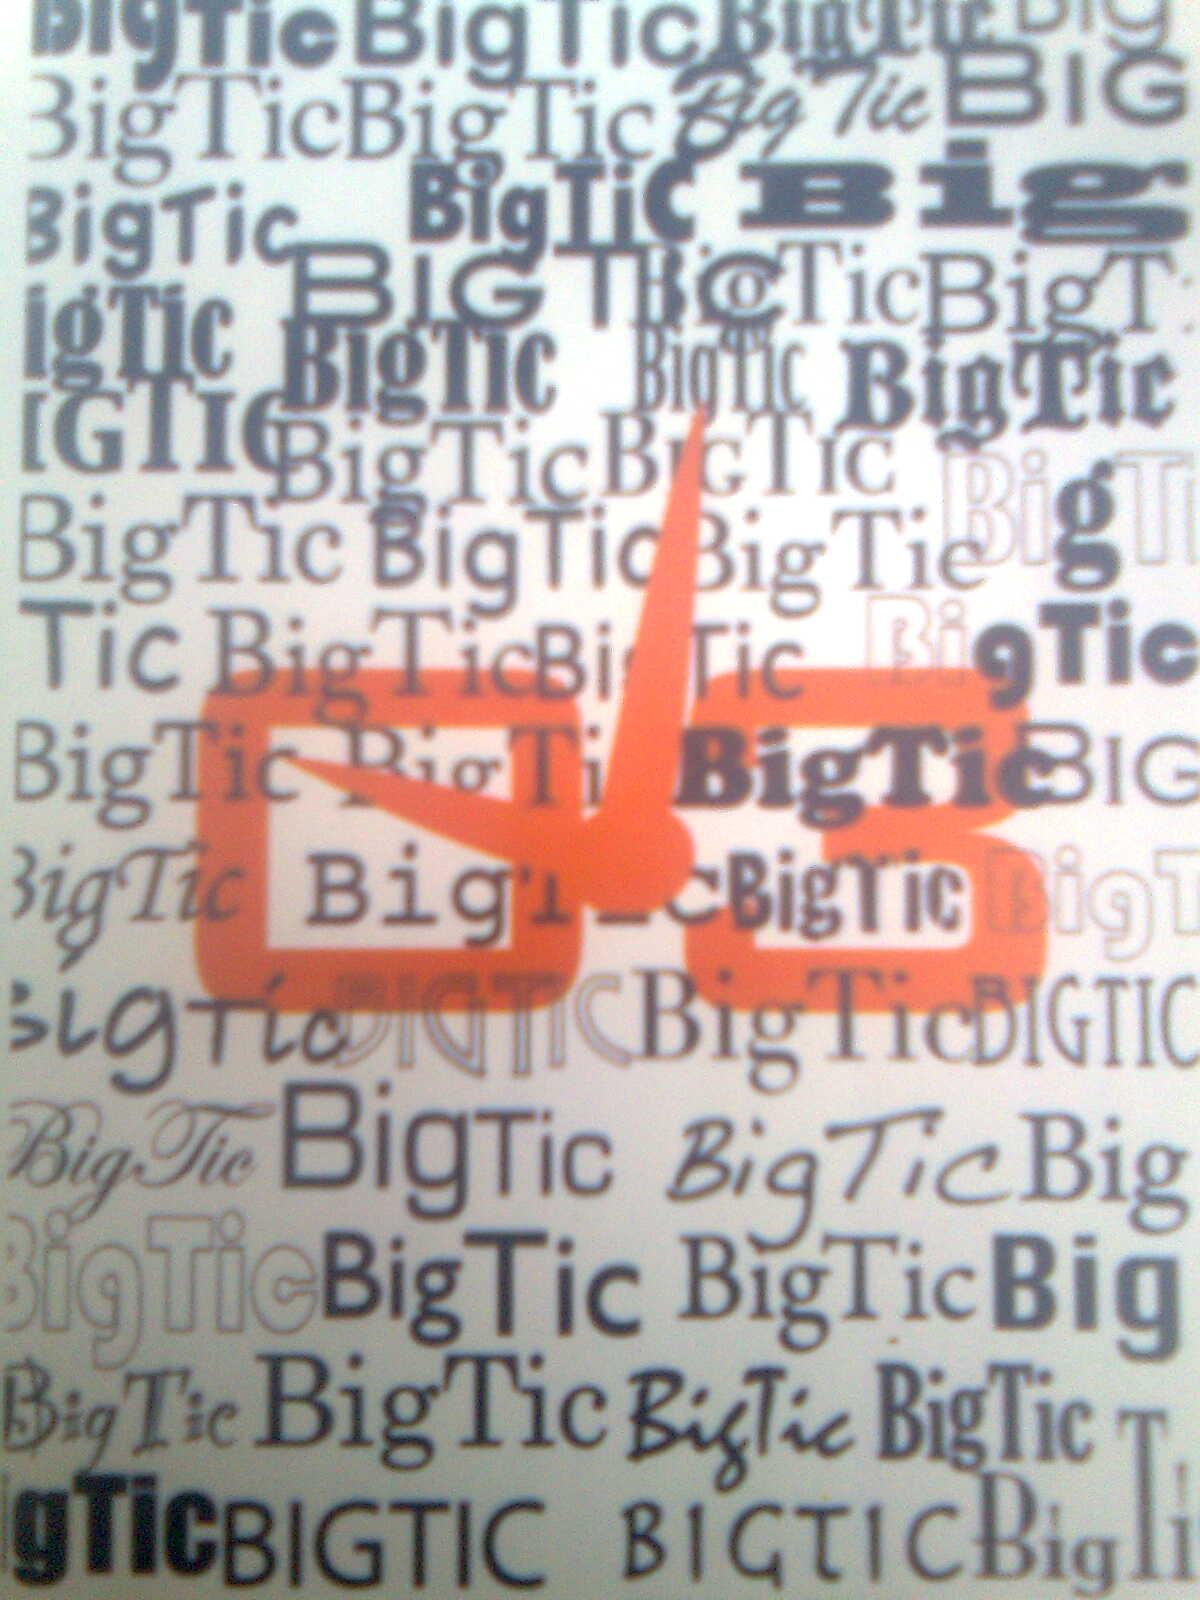 Remarkable maria big tic hope, you